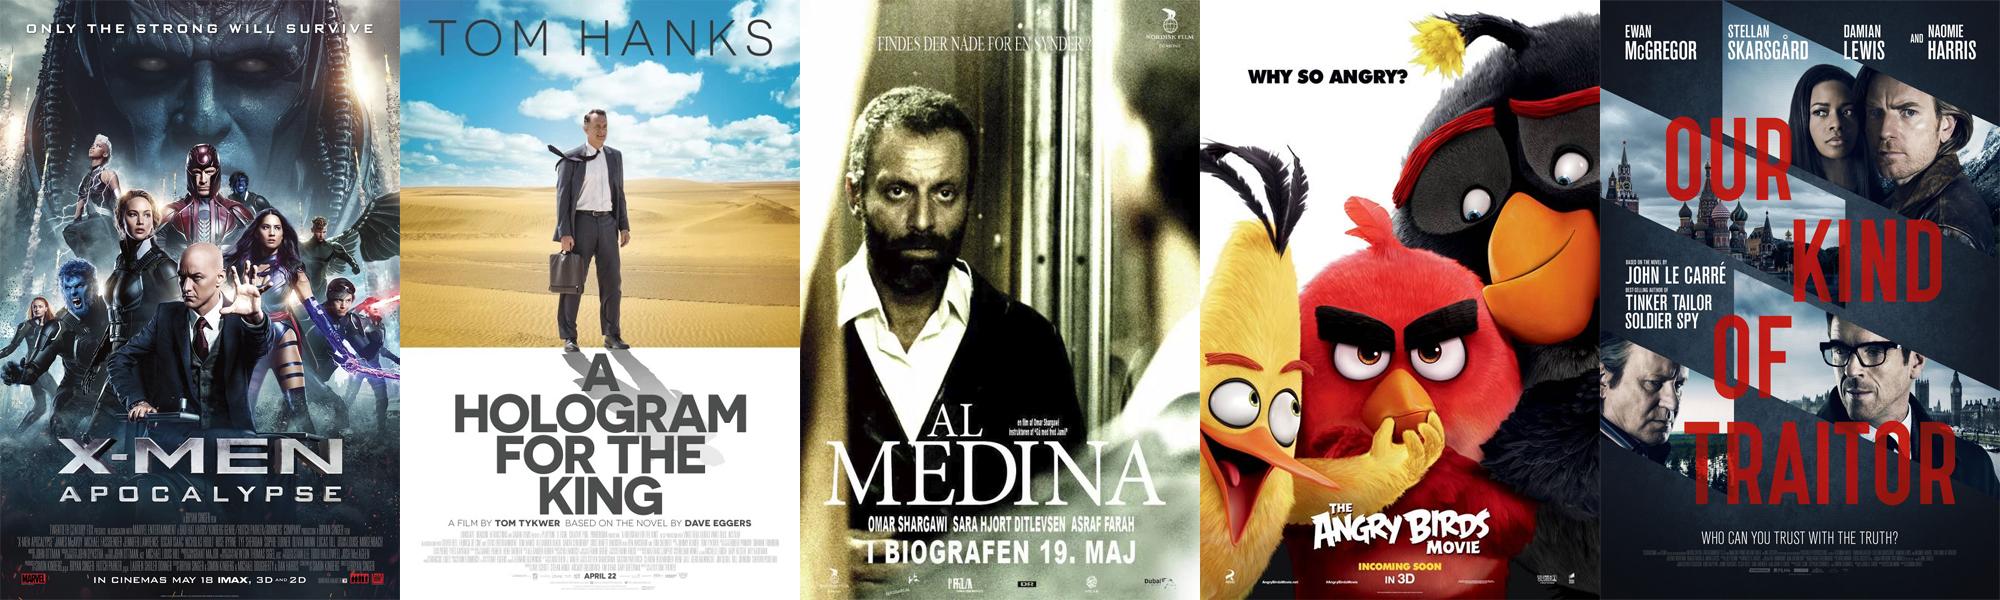 Cinemajour 3 film